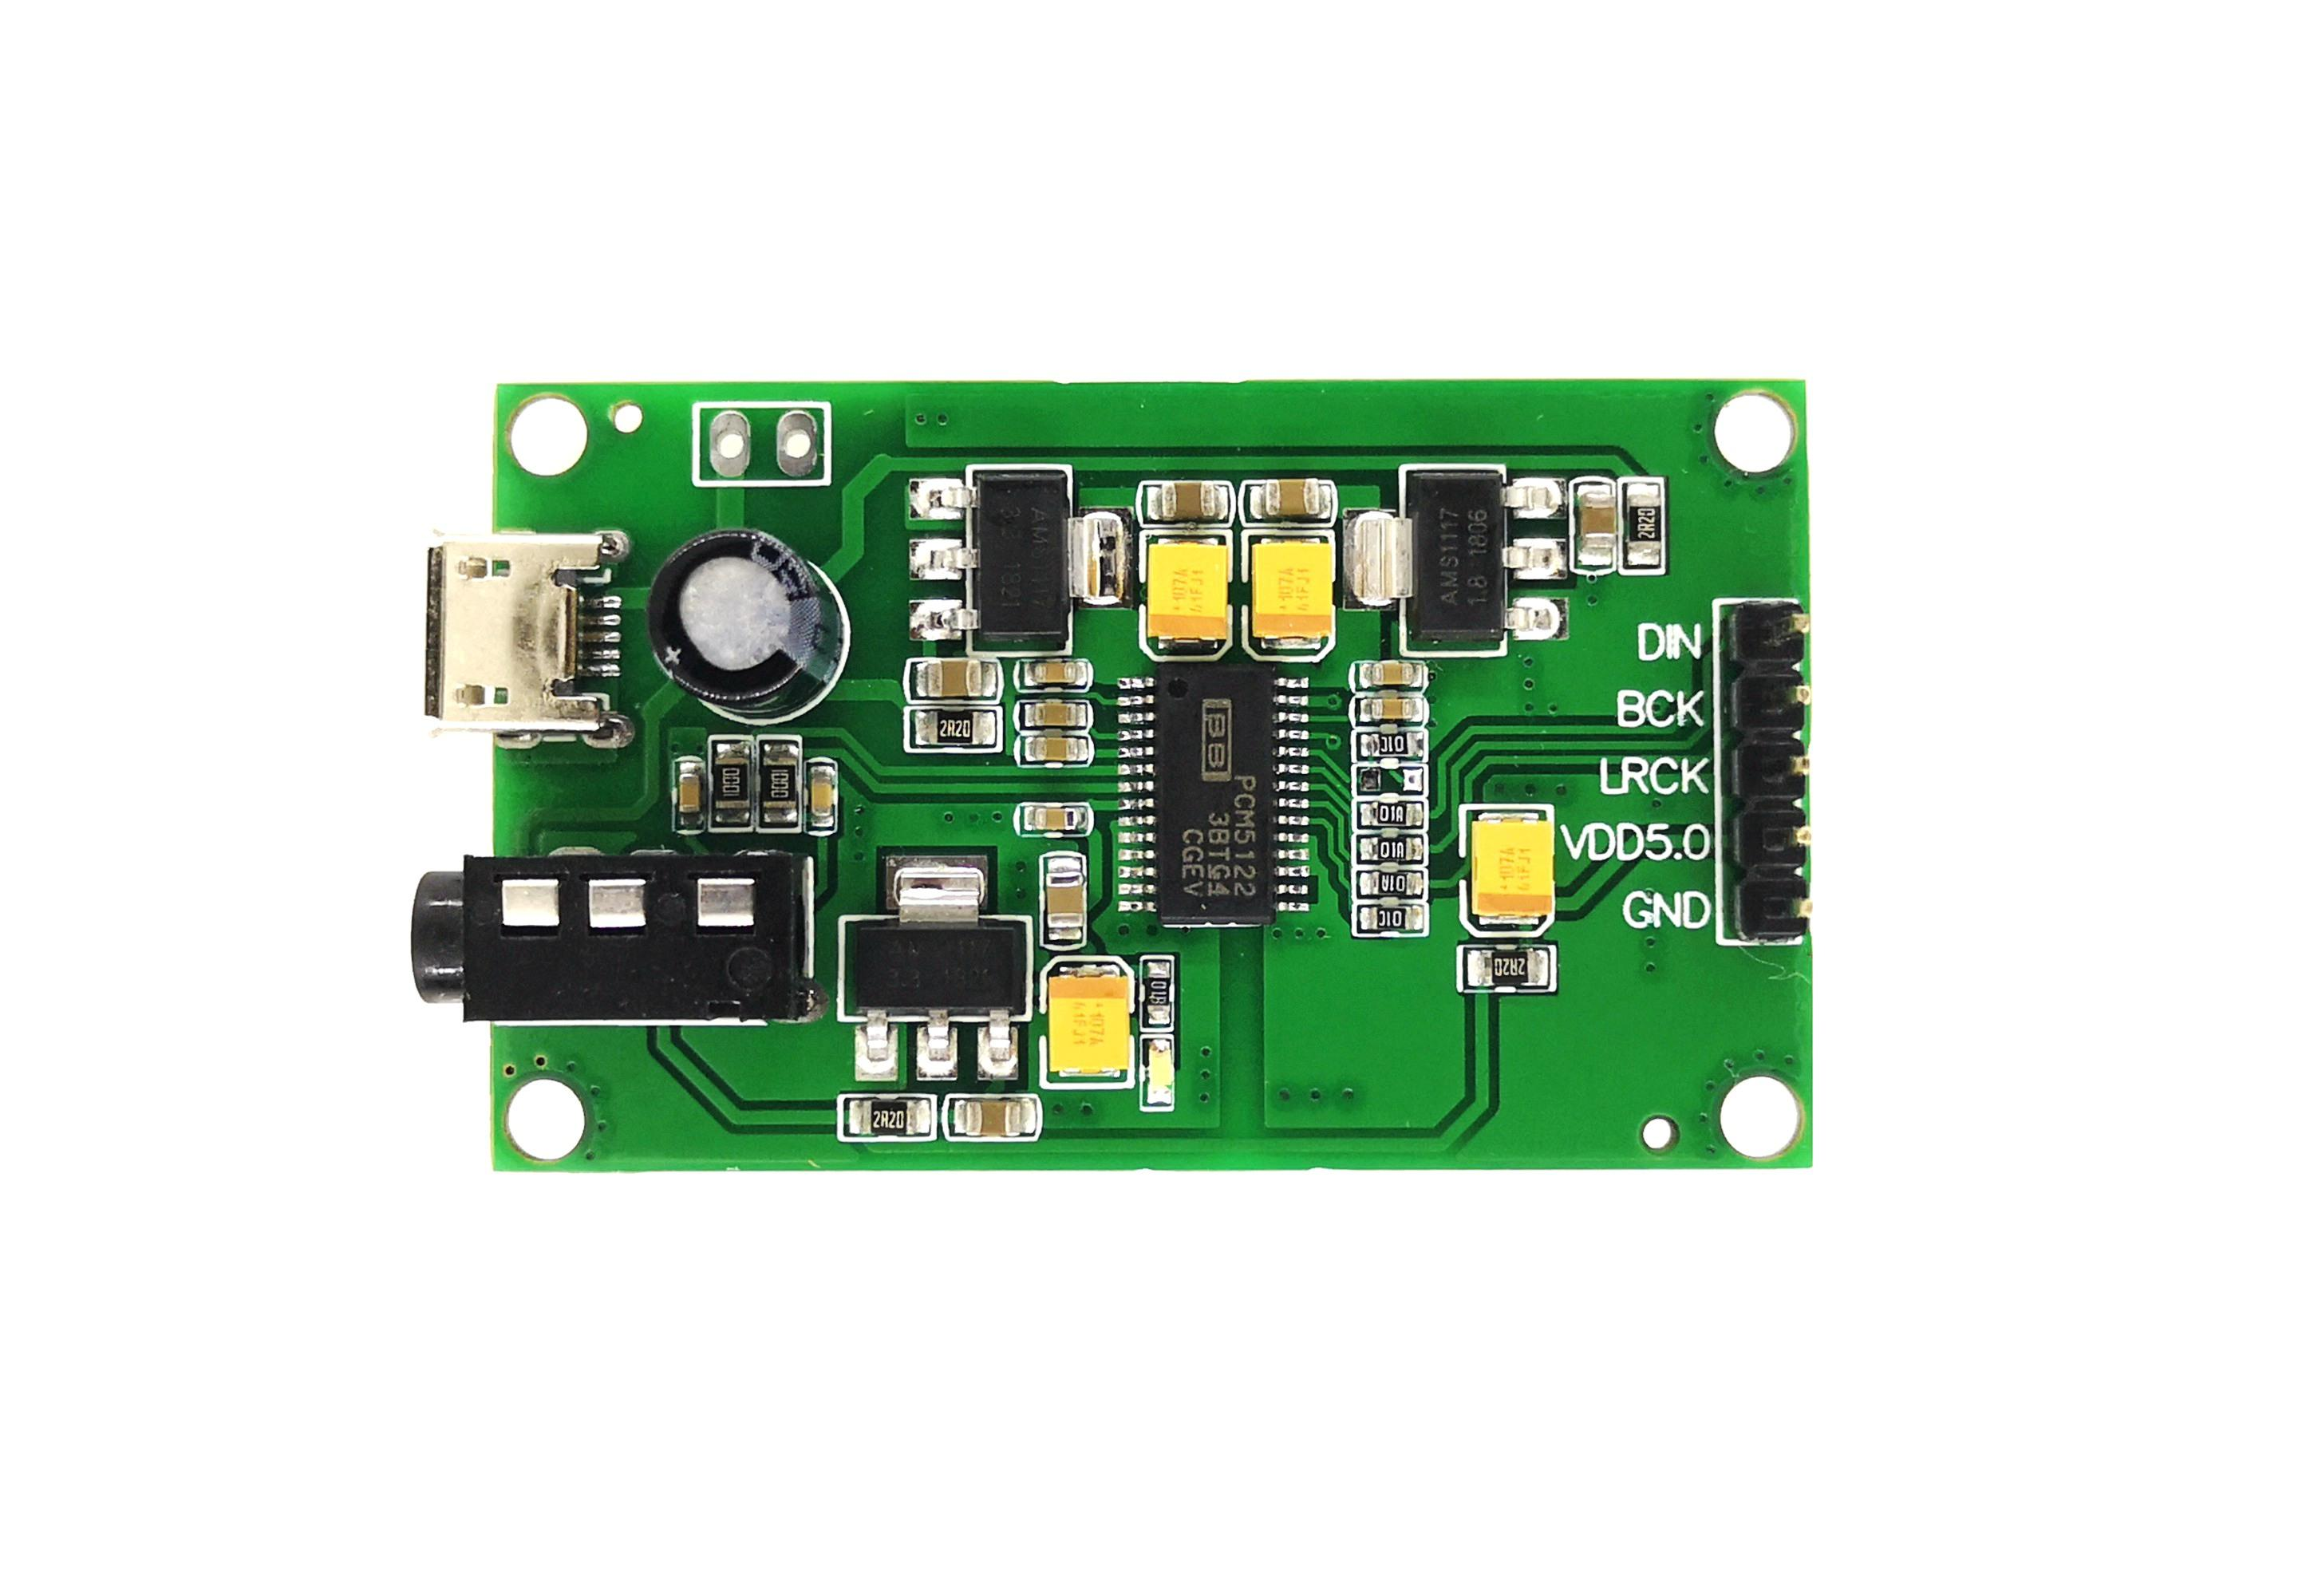 PCM5122 I2S IIS Raspberry Pi Digital Audio Input DAC Decoder Board to AUX  Analog Output